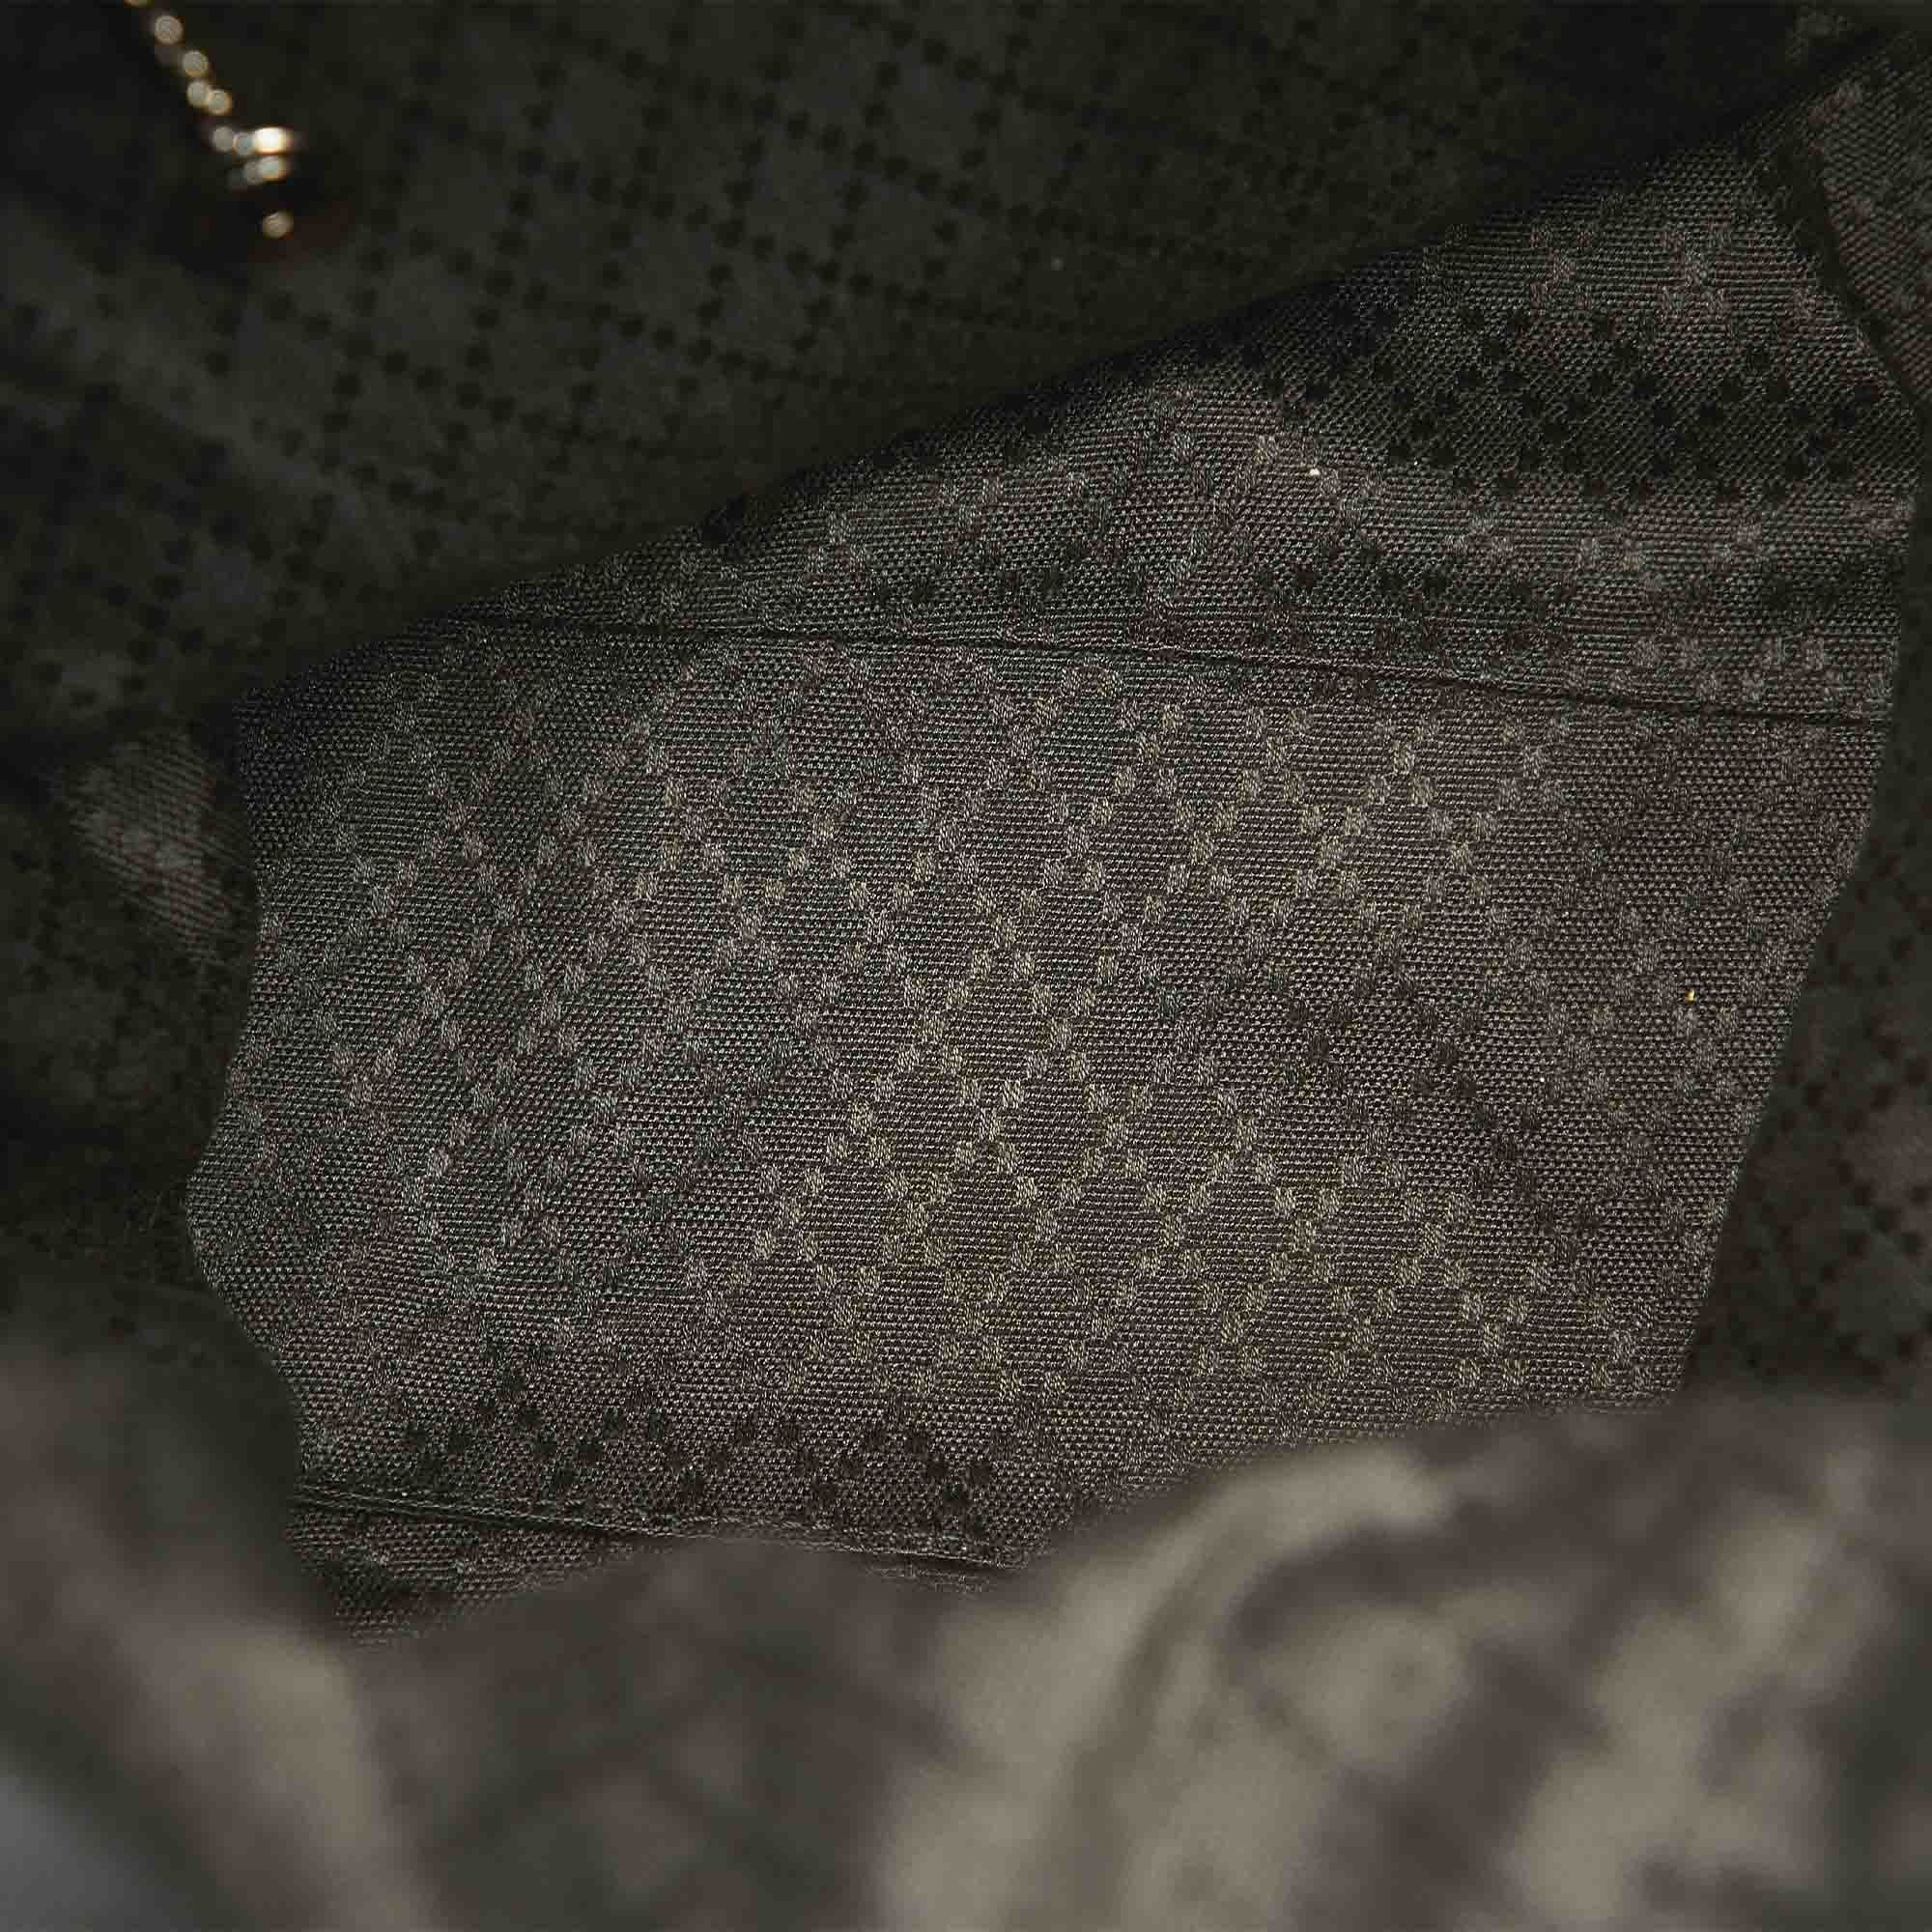 Vintage Gucci Bamboo Canvas Tote Bag Black